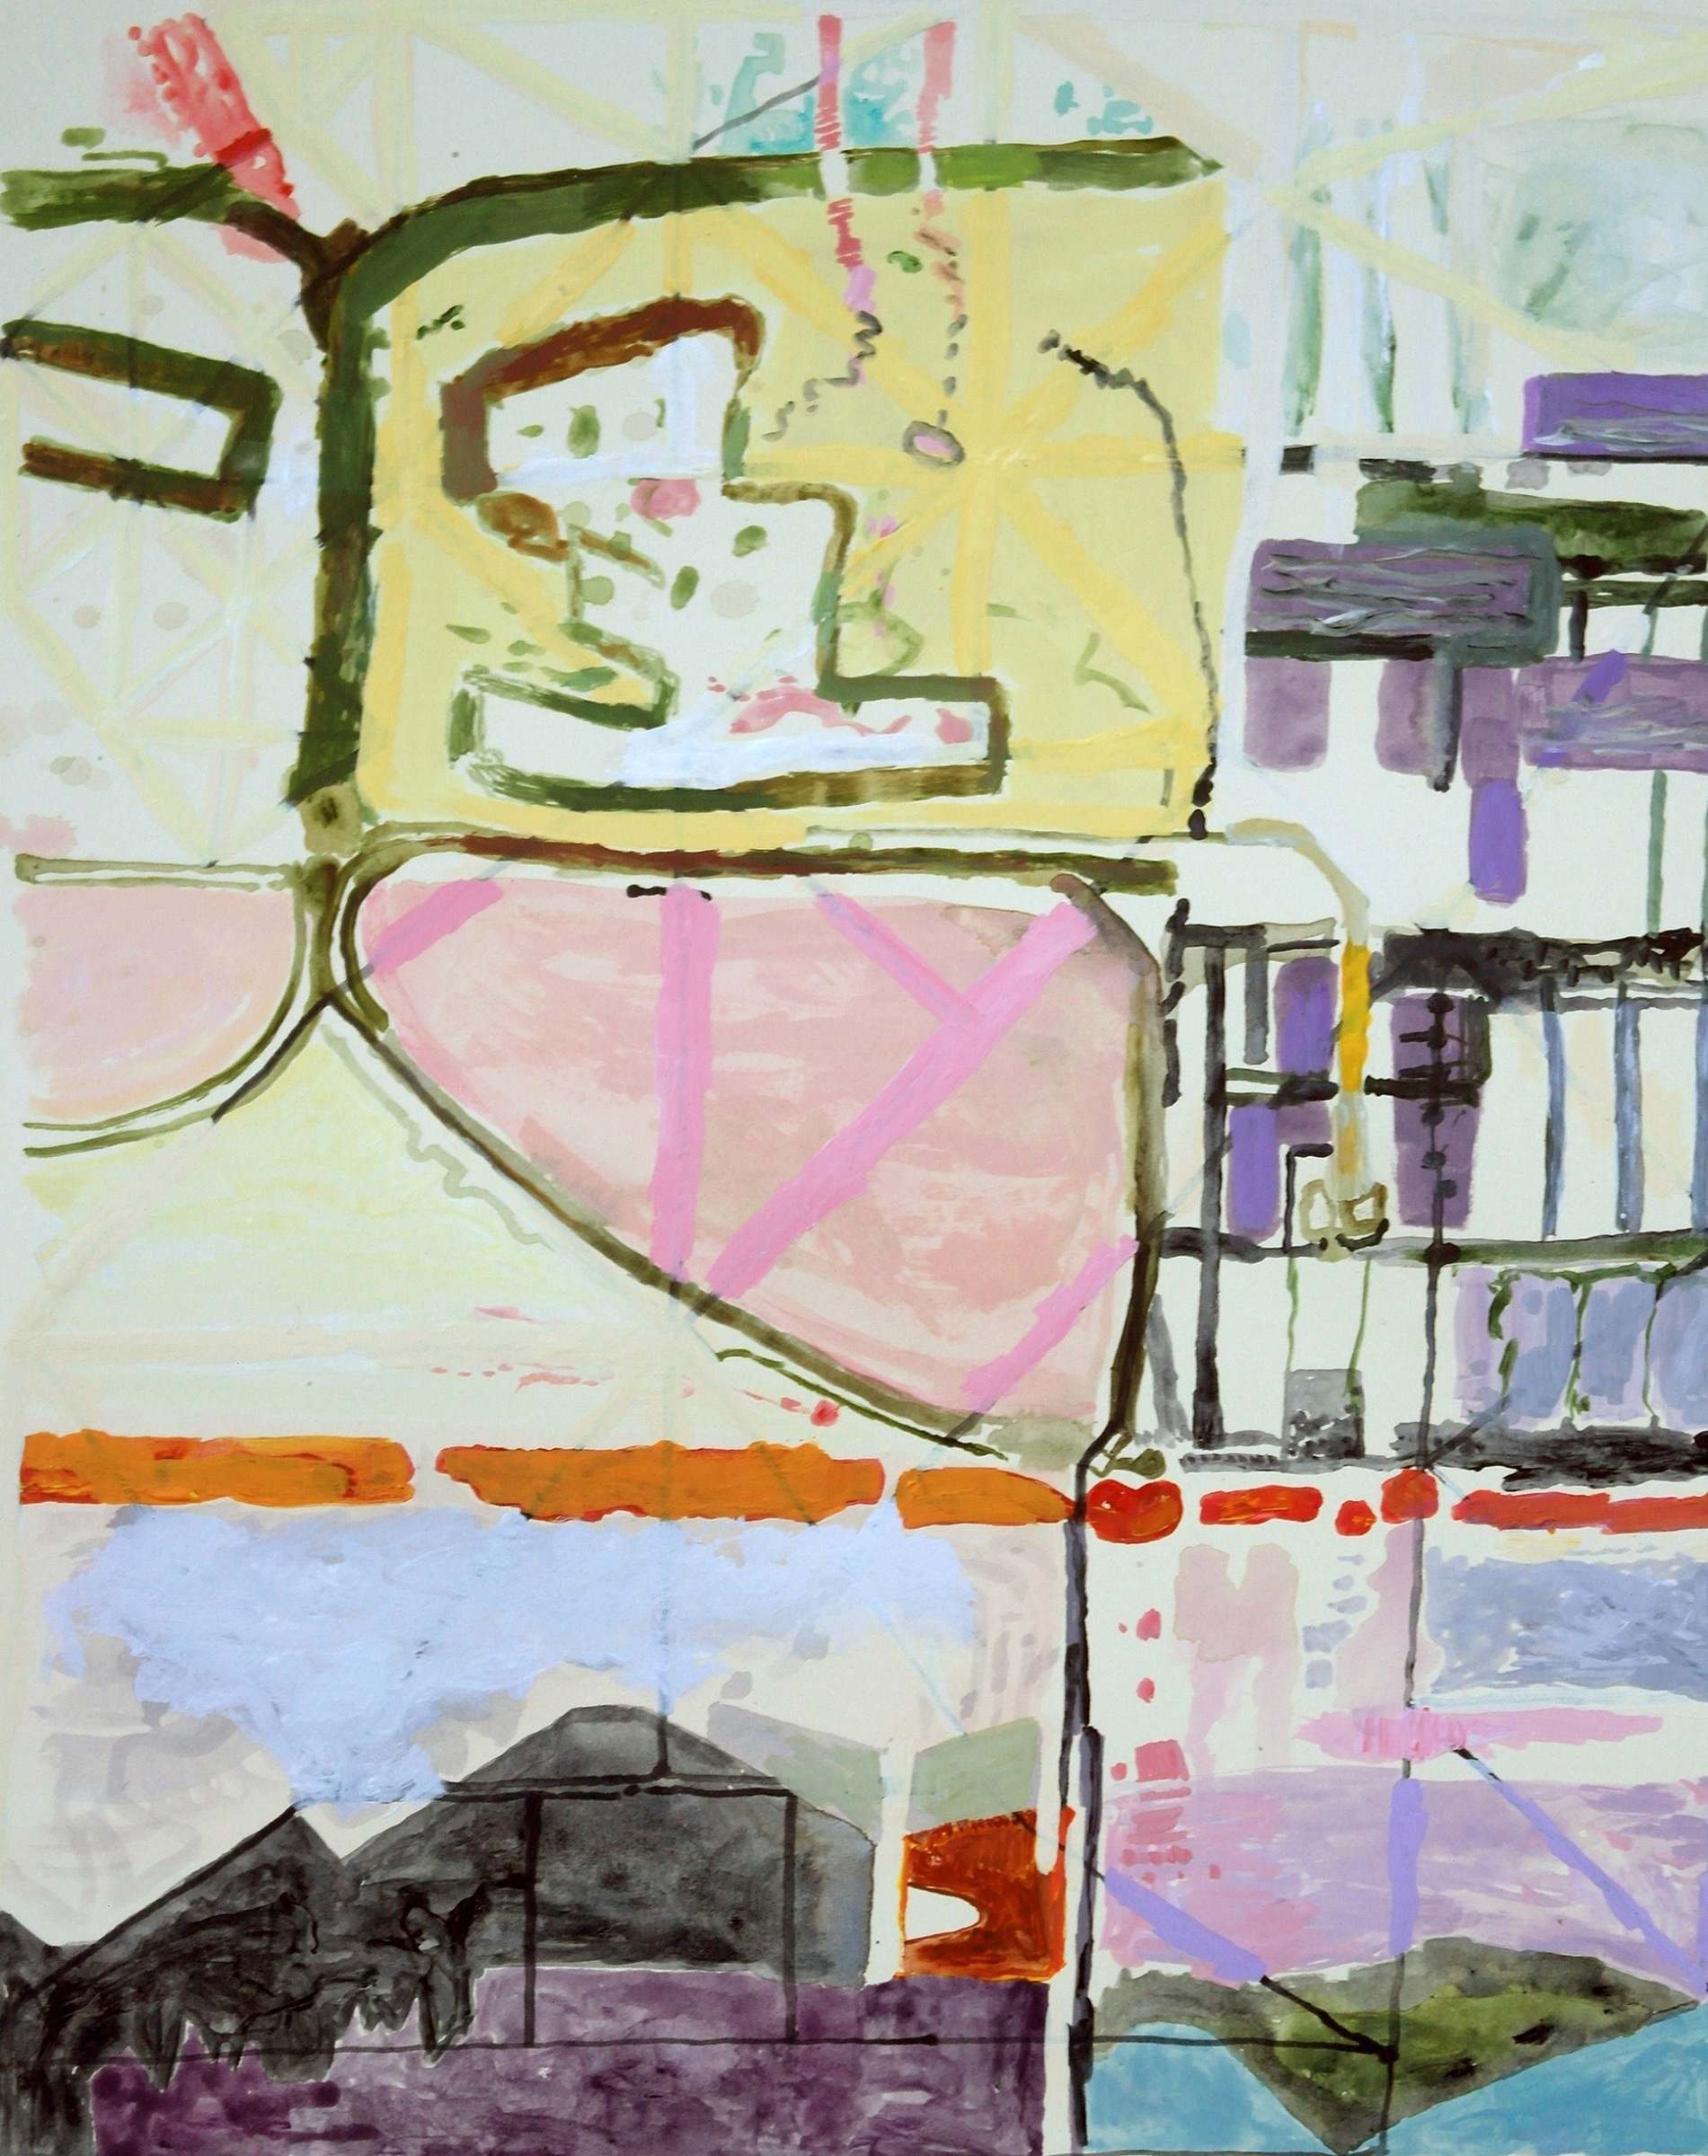 <span class=&#34;link fancybox-details-link&#34;><a href=&#34;/artists/88-iain-nicholls/works/10548-iain-nicholls-cp-resurrection-3/&#34;>View Detail Page</a></span><div class=&#34;artist&#34;><span class=&#34;artist&#34;><strong>Iain Nicholls</strong></span></div><div class=&#34;title&#34;><em>CP Resurrection 3</em></div><div class=&#34;medium&#34;>acrylic</div><div class=&#34;price&#34;>£600.00</div>